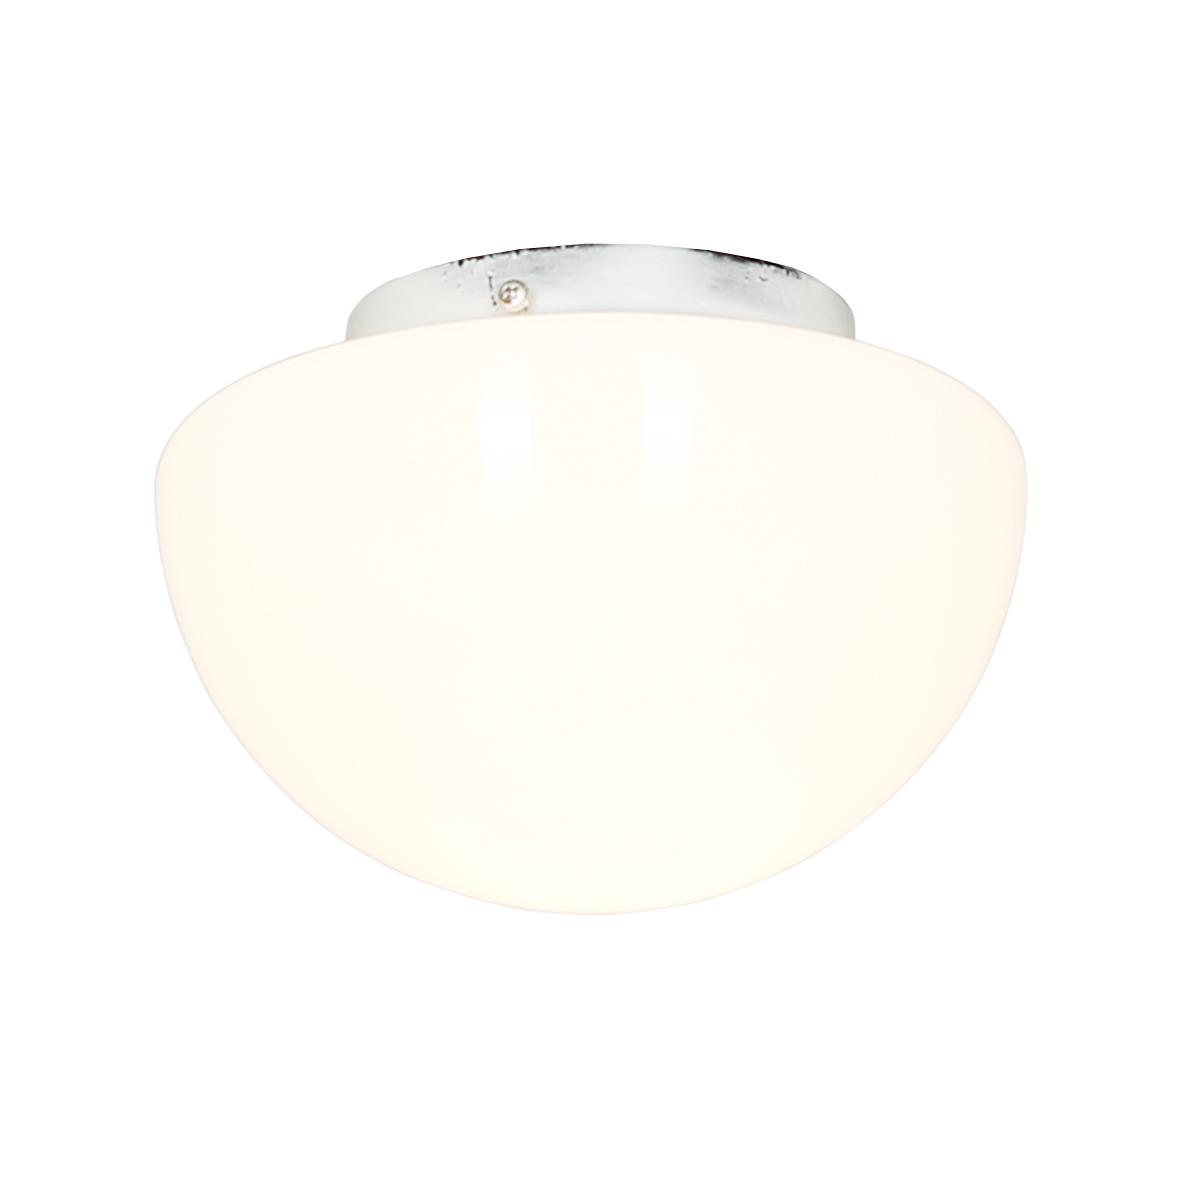 Kit luz 1 s SH 10239 color blanco gastado